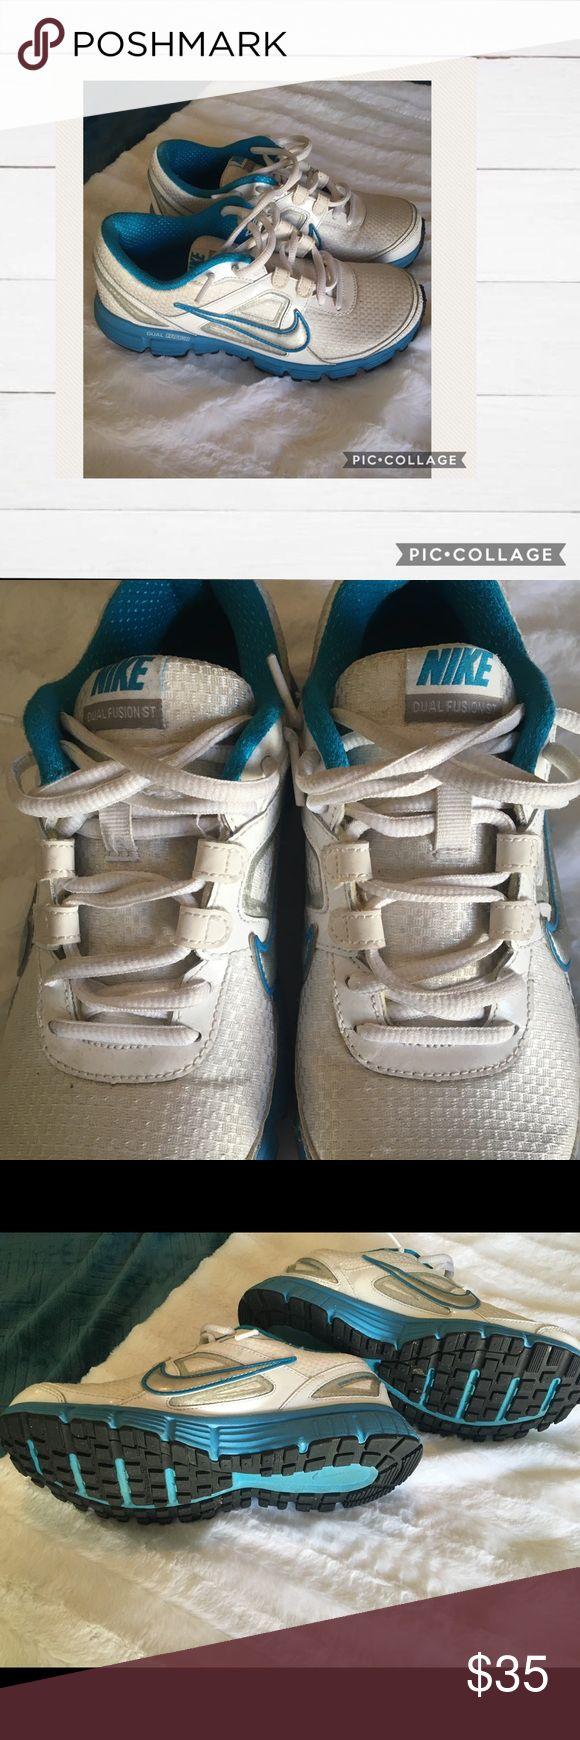 Nike Dual Fusion Tennis Shoes (Women's 7) Gently worn Women's Size 7 Nikes (white & blue) Nike Shoes Sneakers